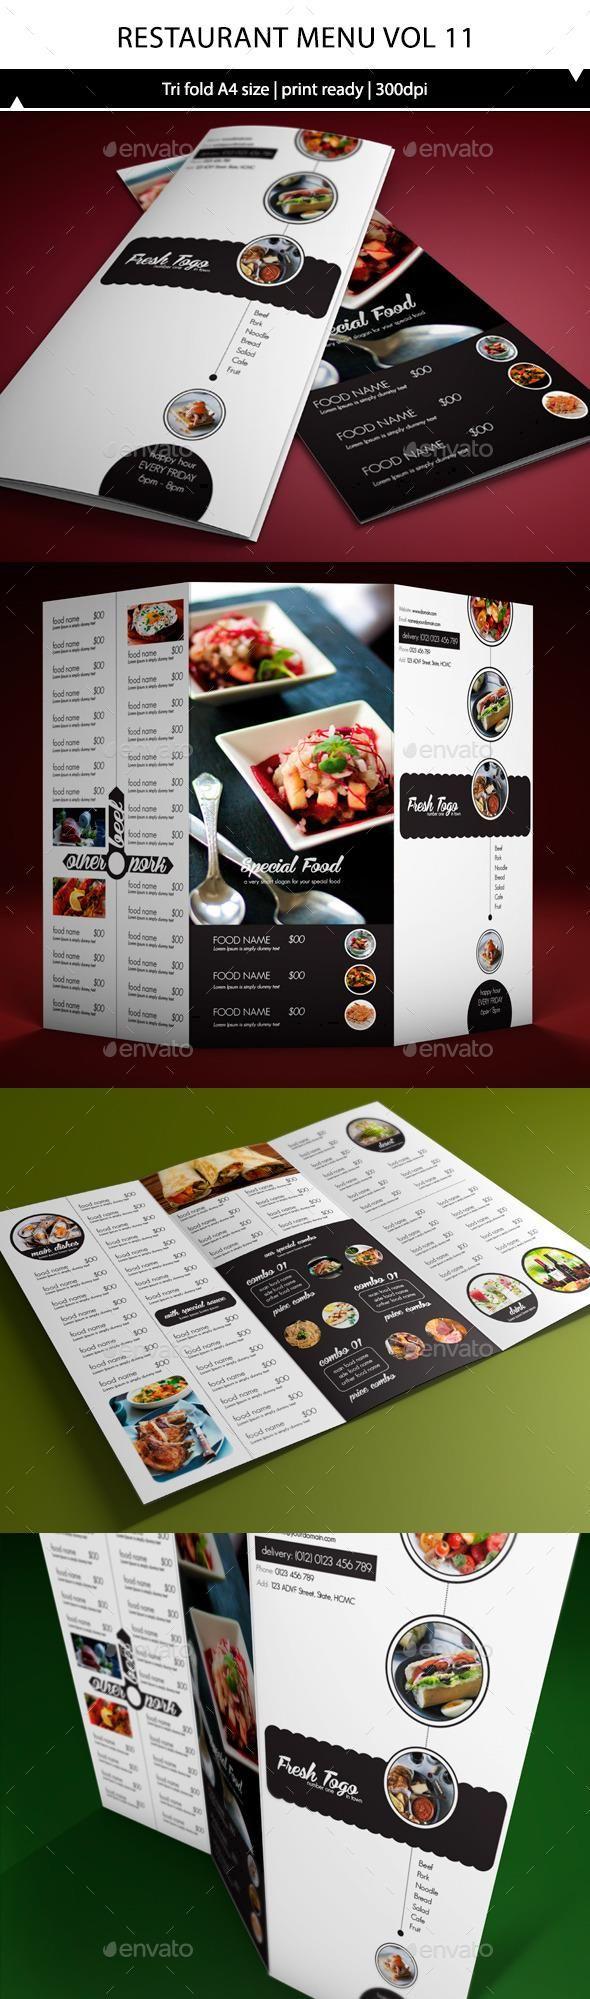 Restaurant Menu A4 Trifold Vol11